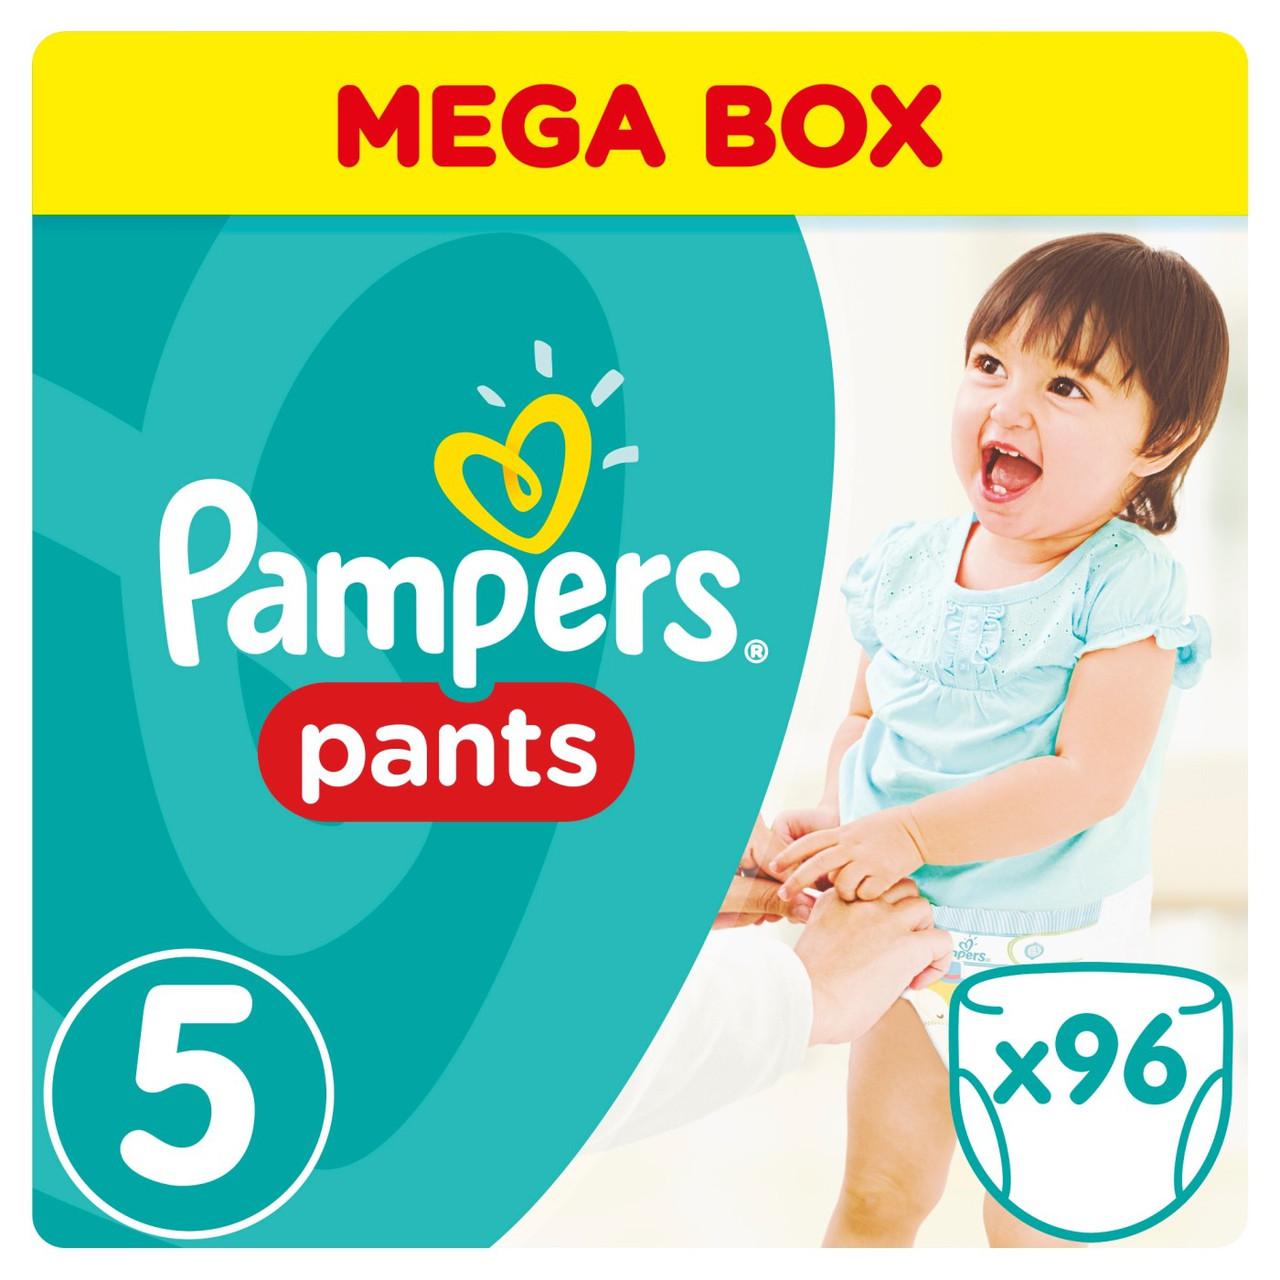 9bdbcc9f8cbc Pampers. Трусики Pampers Pants Box Размер 5 (Junior) 12-18 кг, 96 шт ...